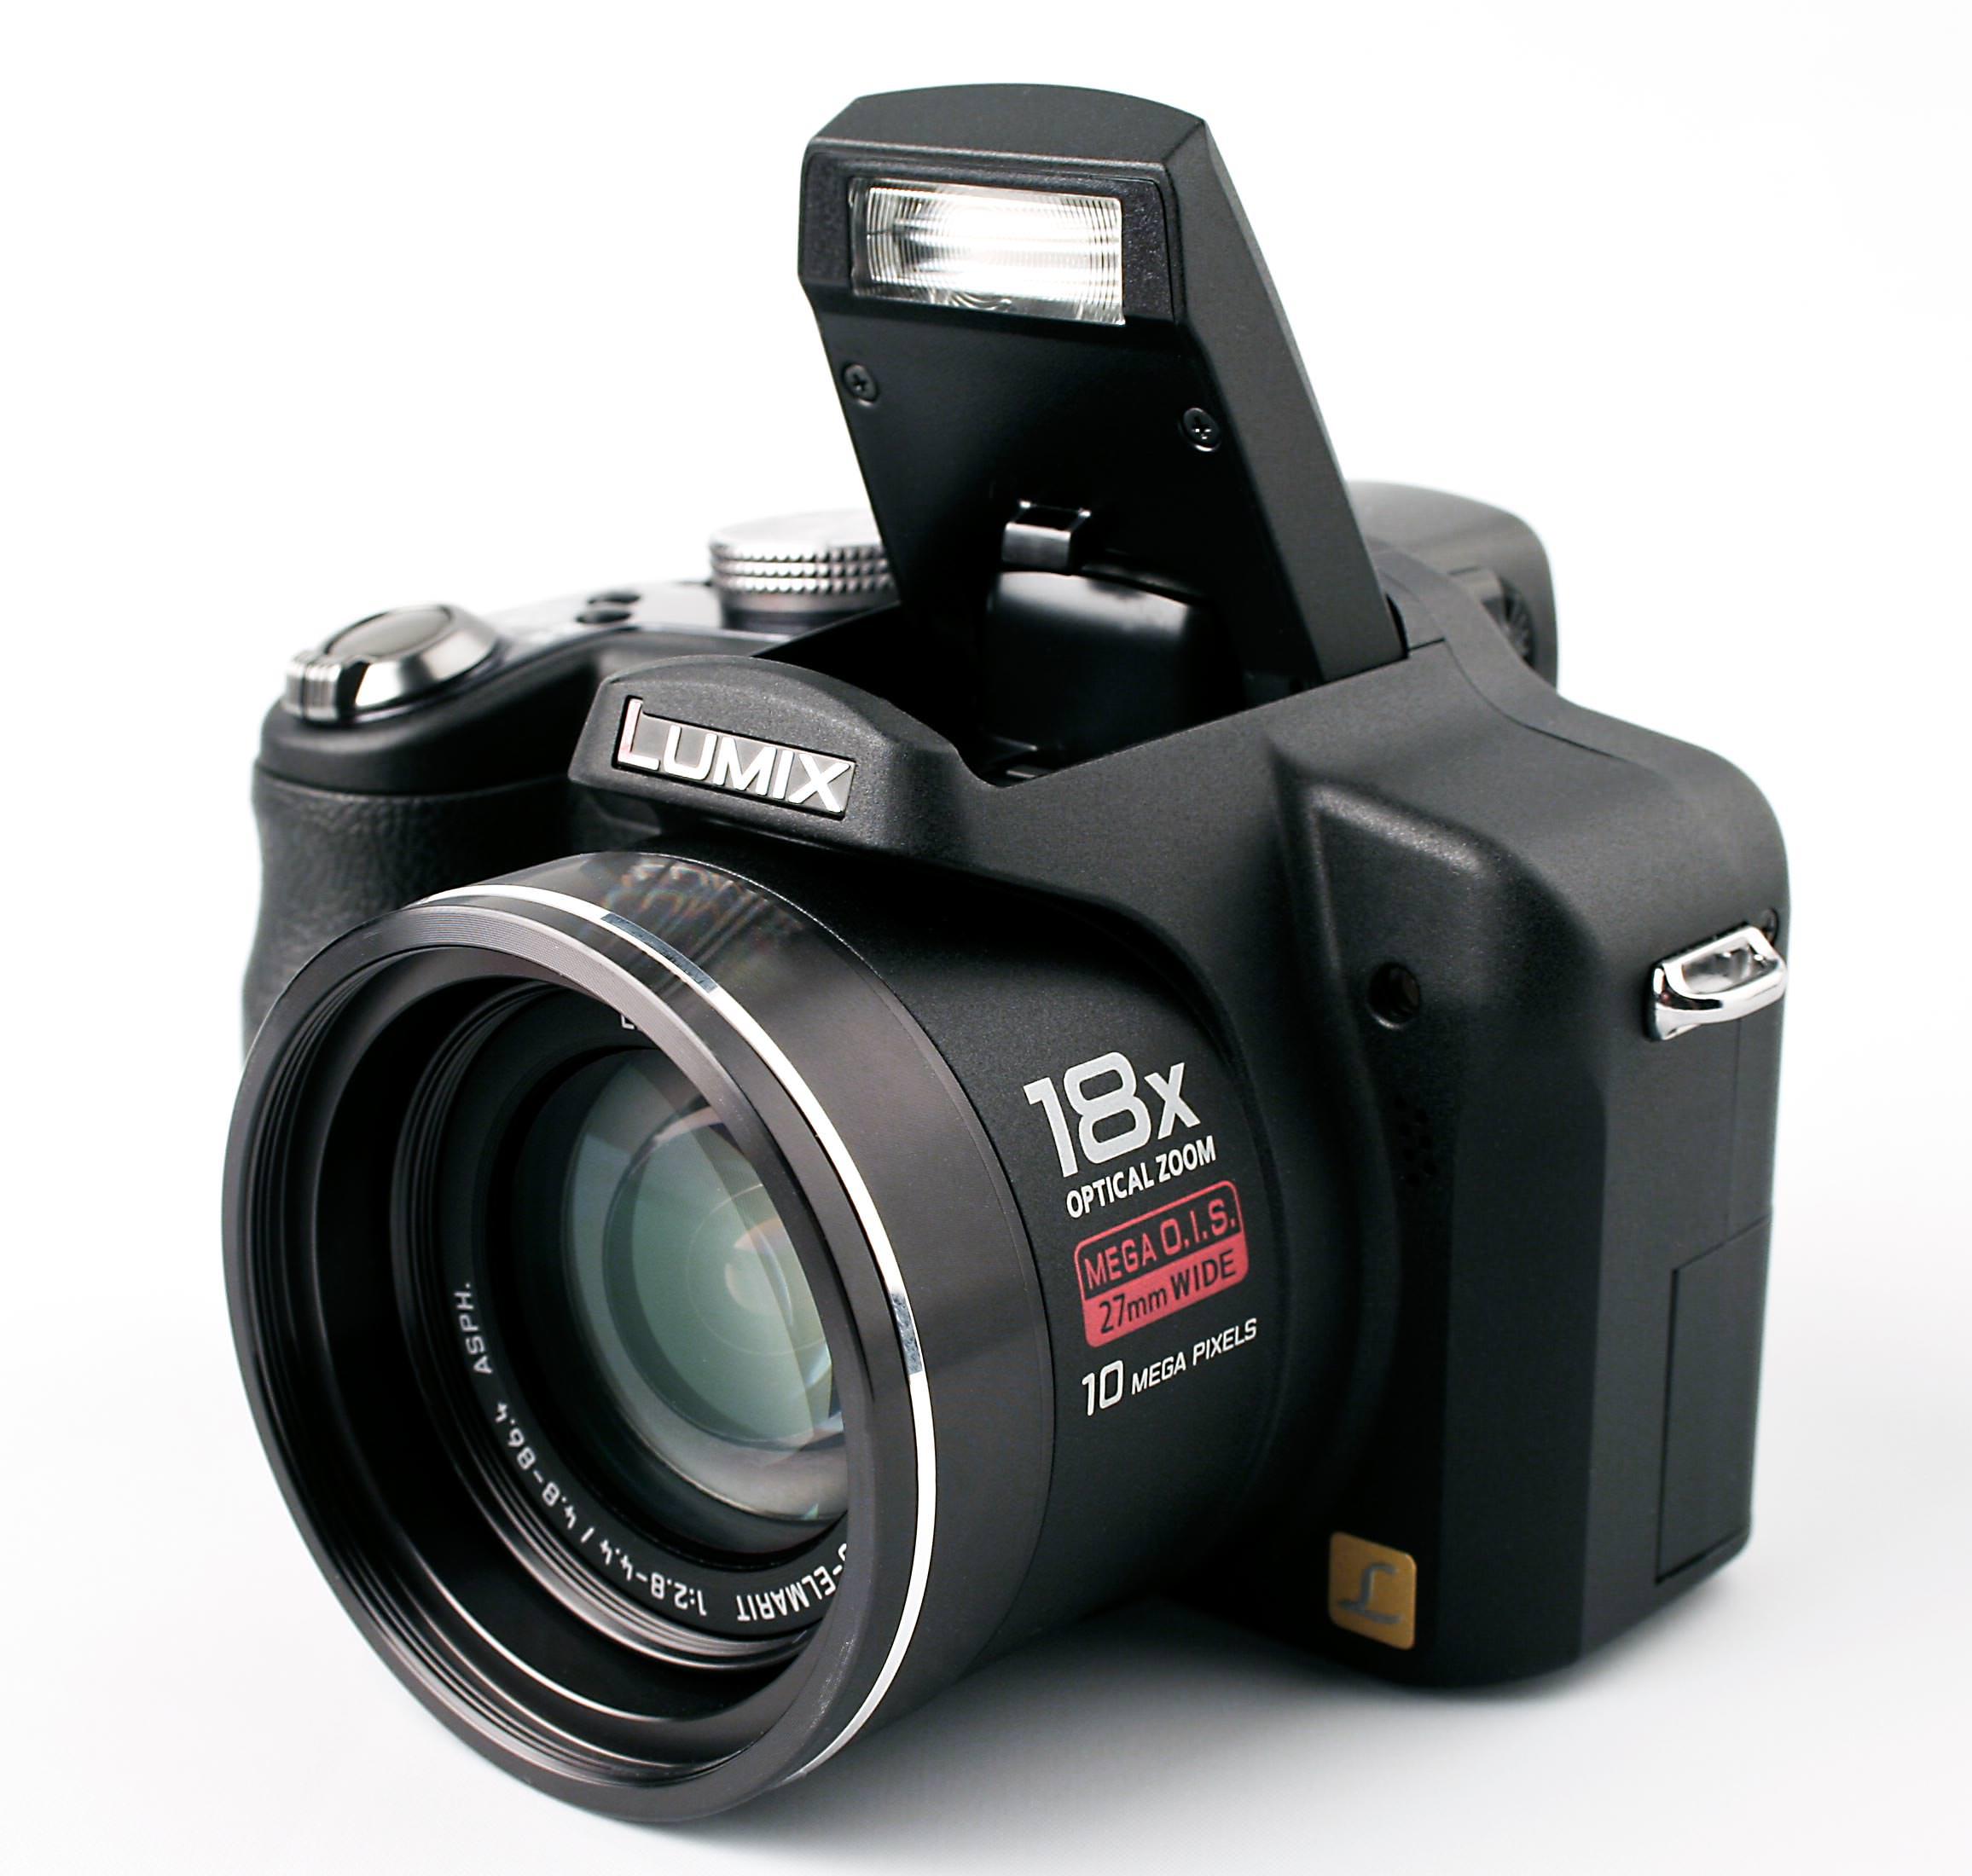 panasonic lumix dmc fz28 digital camera review rh ephotozine com panasonic lumix dmc fz28 mode d'emploi panasonic lumix dmc-fz28 instruction manual